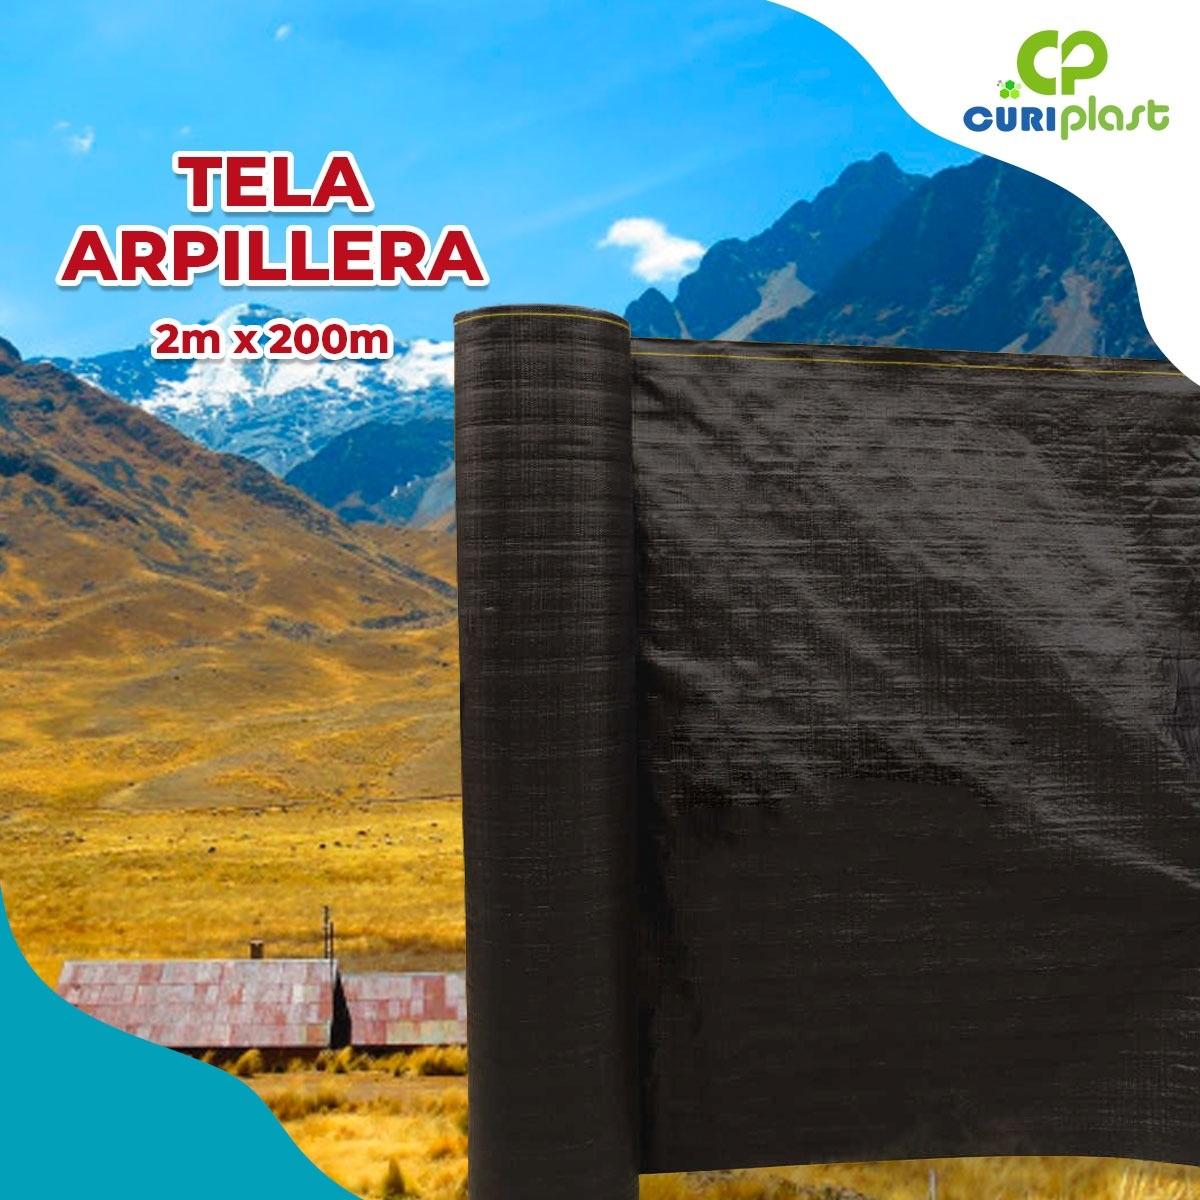 tela arpillera negra de 2m x 200m